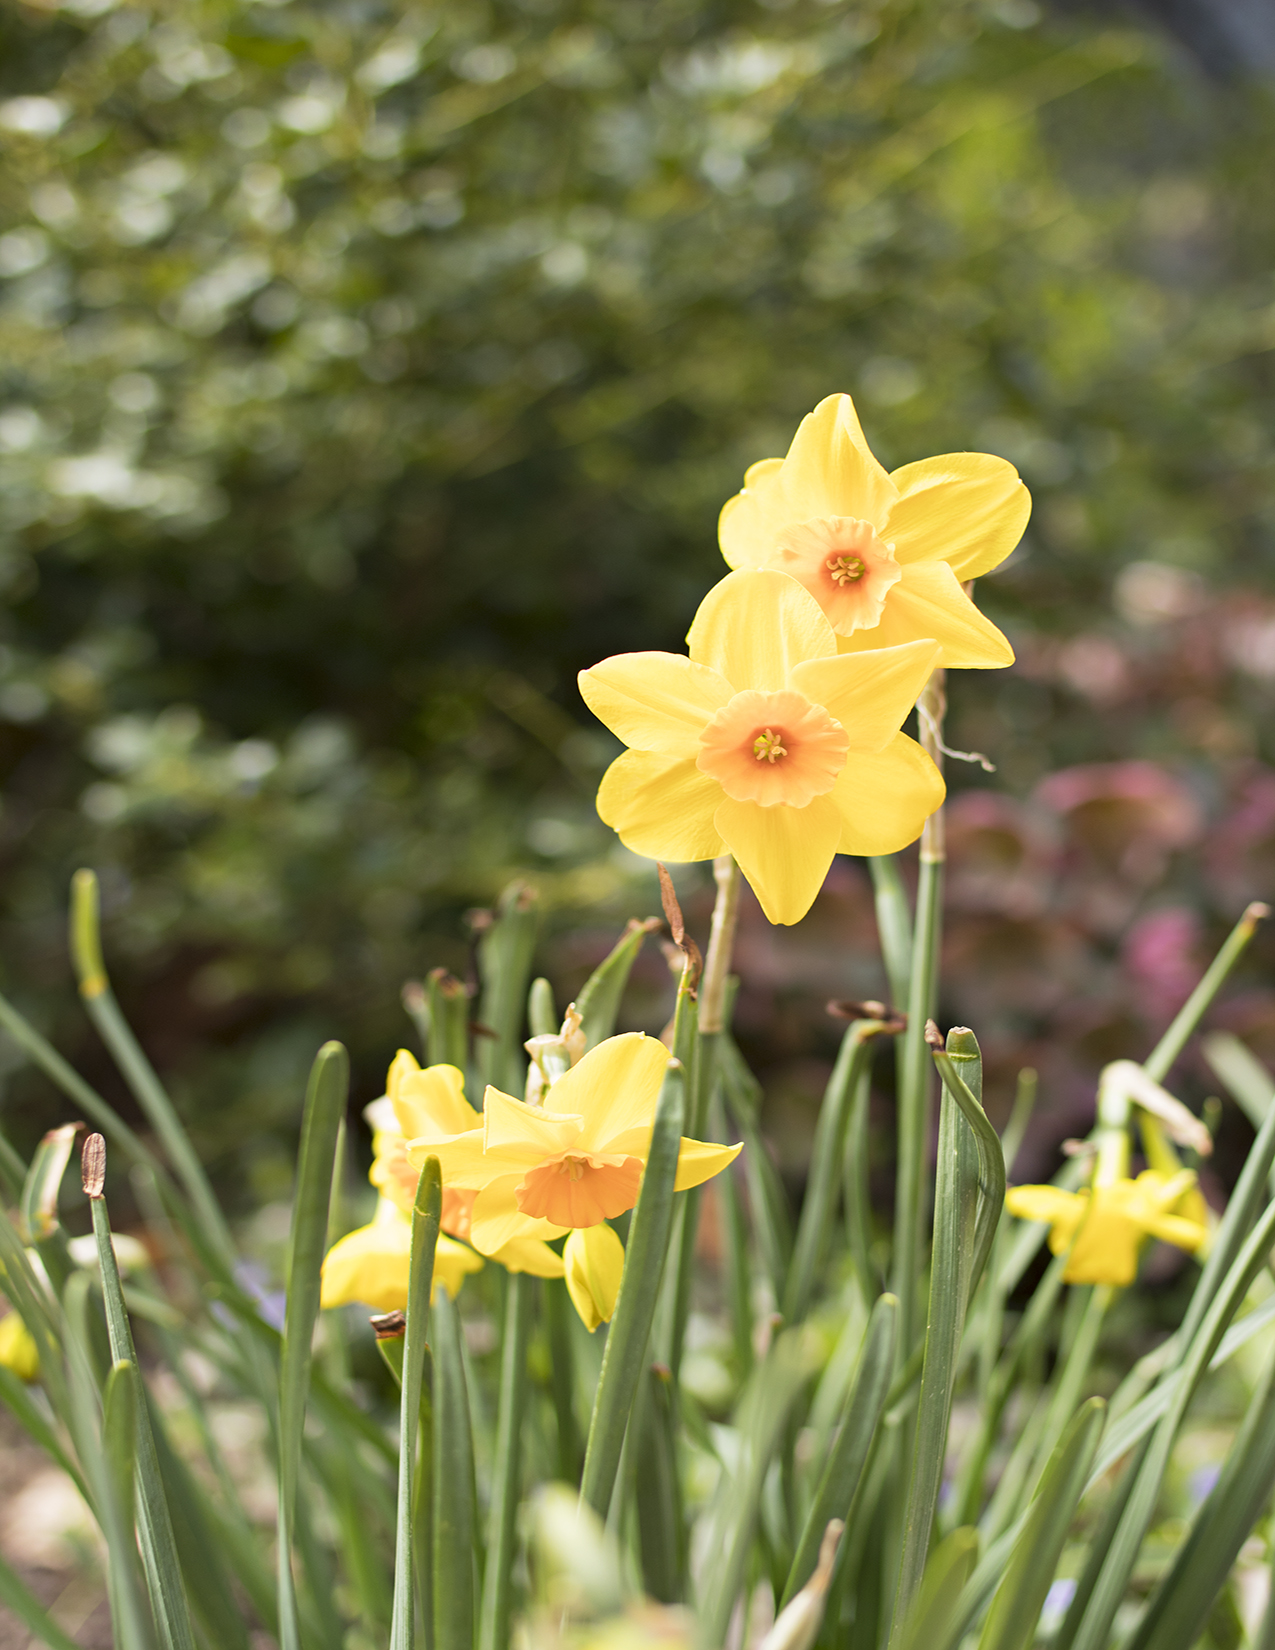 Eileen_Ko_Assignment_4_Two_Yellow_Flowers_Green